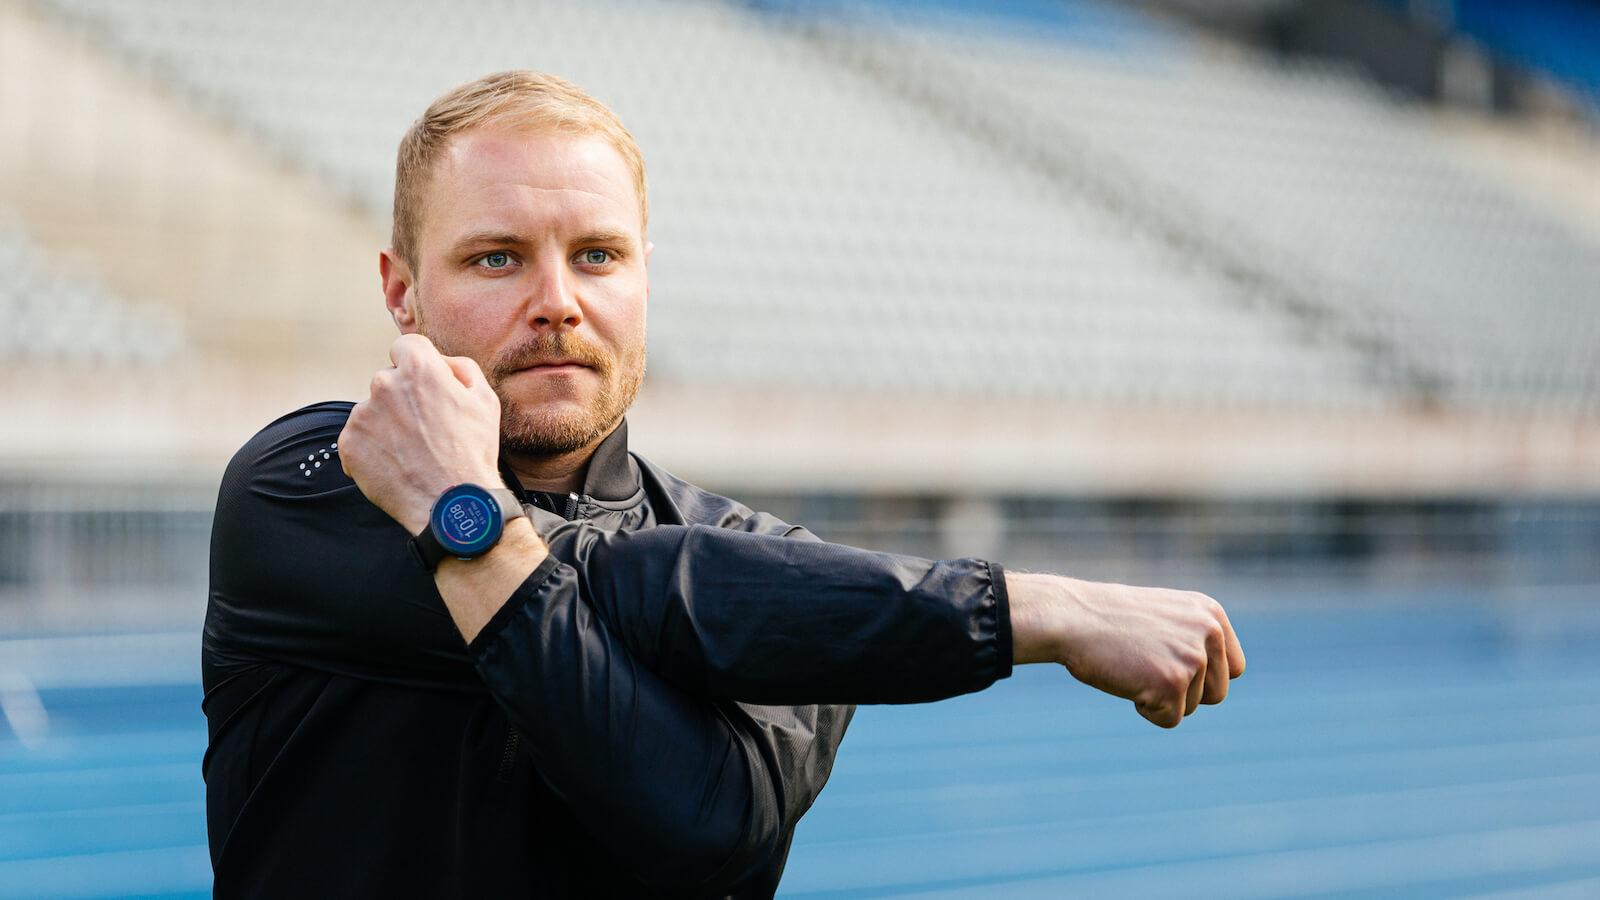 Polar Vantage V2 multisport smartwatch optimizes your training effort